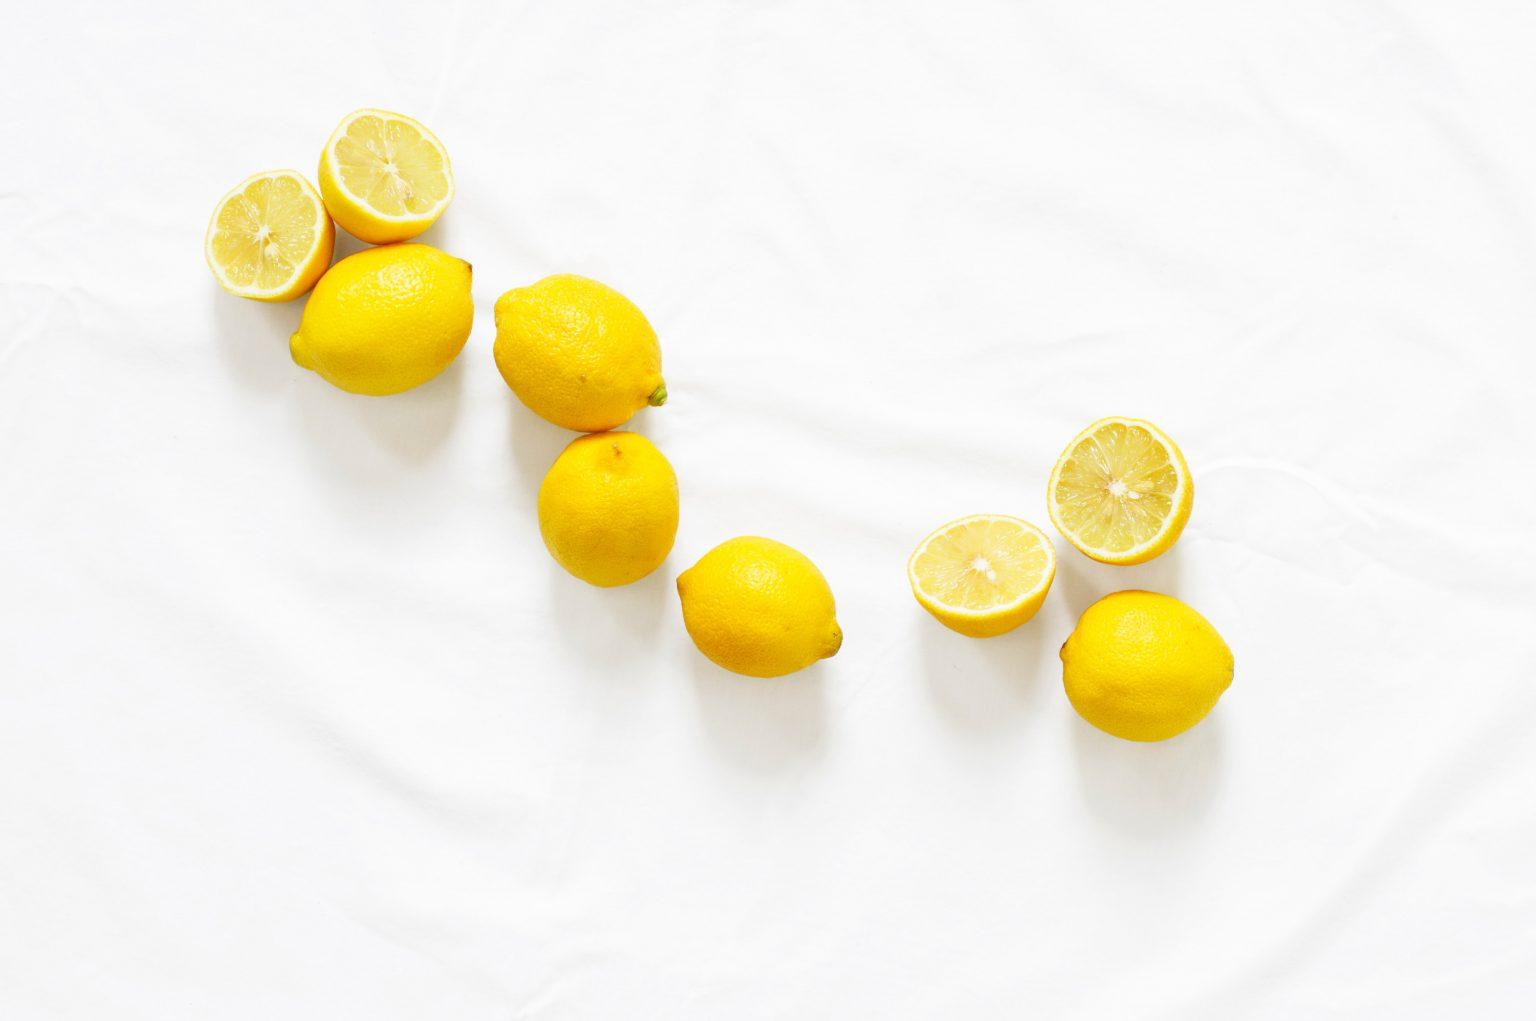 Lemons - lauren-mancke-sil2Hx4iupI-unsplash